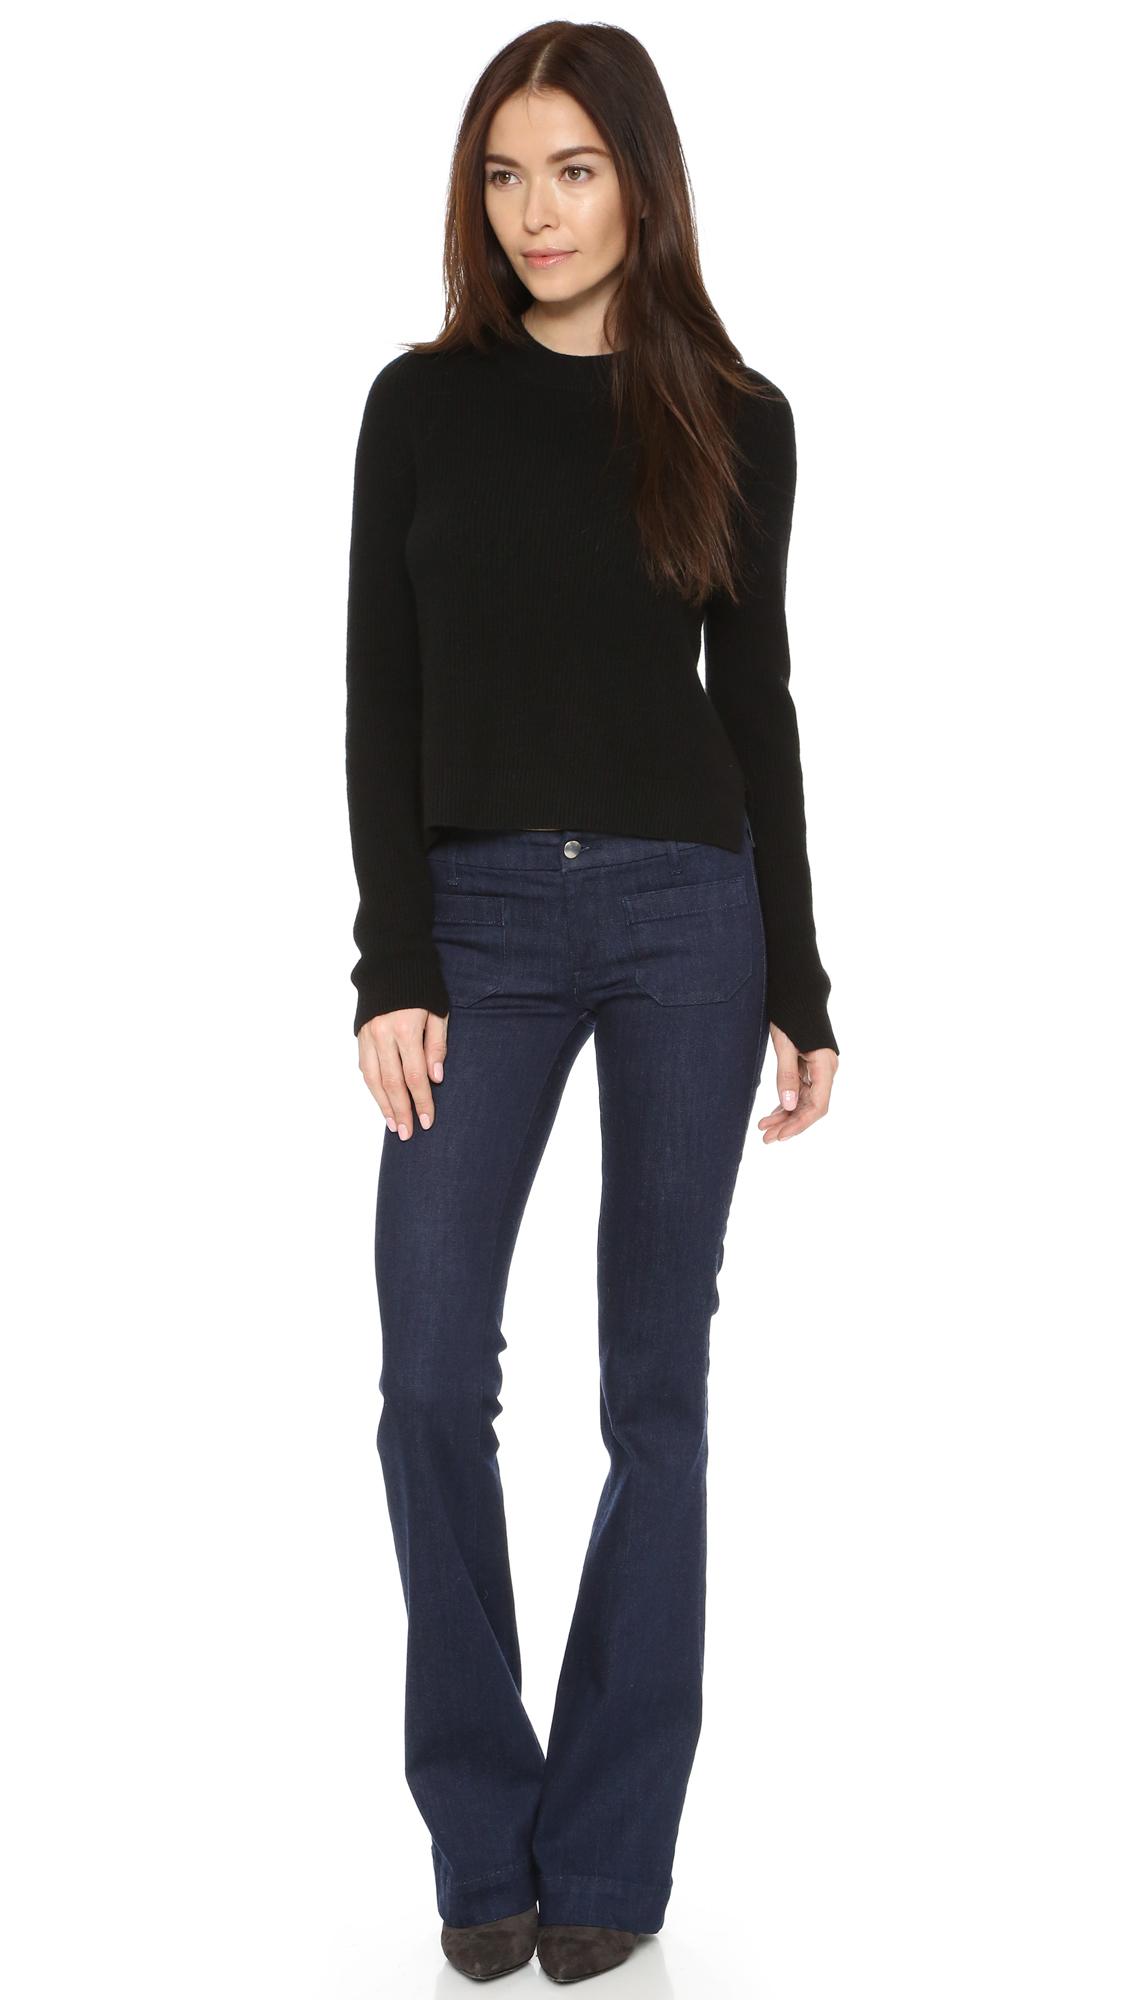 The Seafarer Penelope Flare Jeans - Dark Wash in Blue